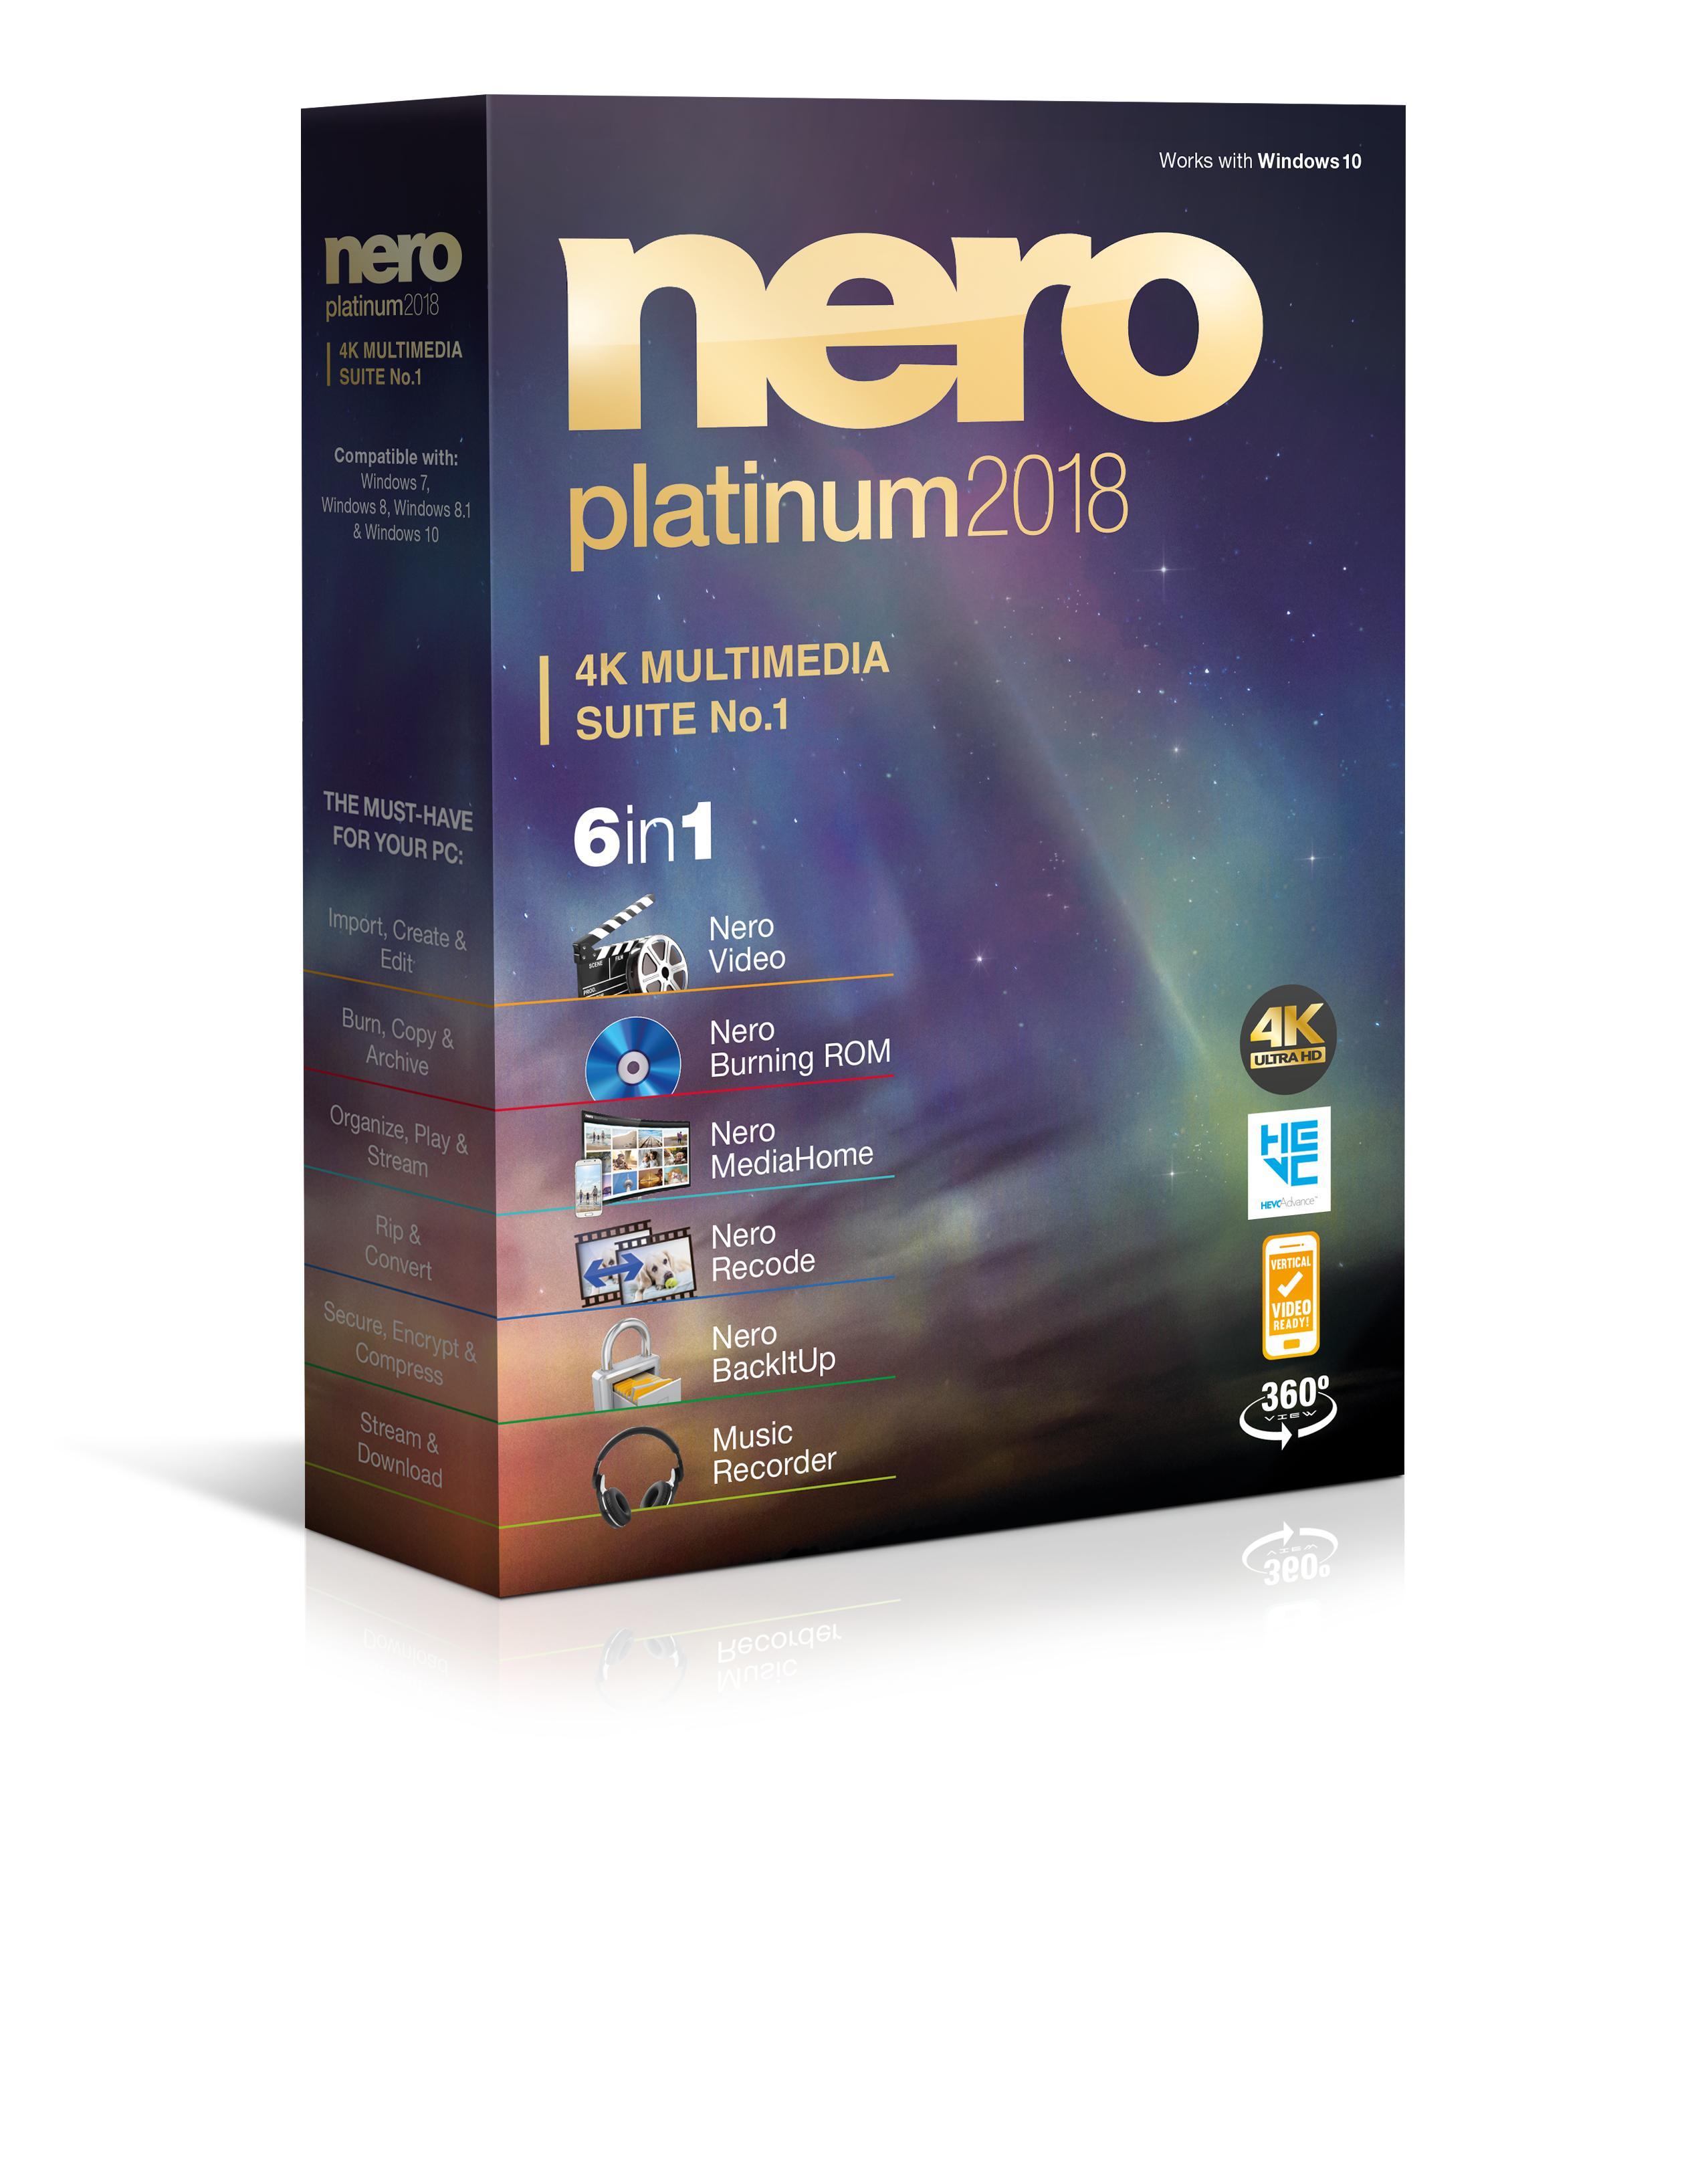 nero burner free download full version windows 10